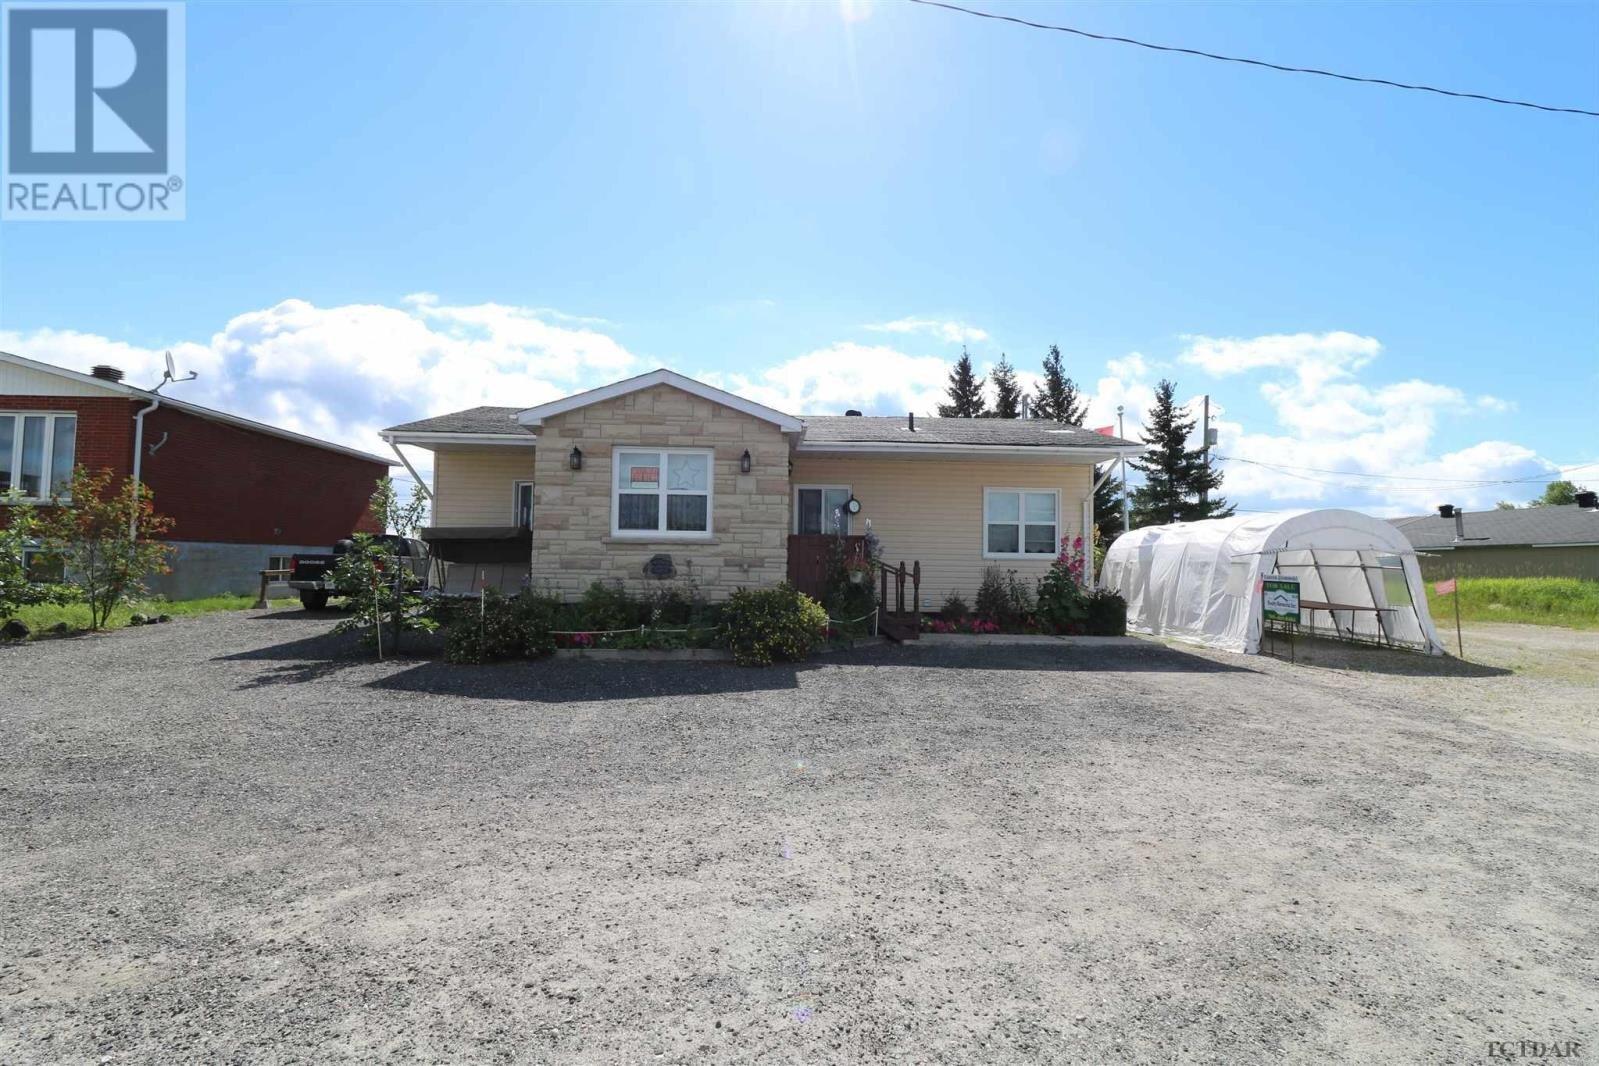 Townhouse for sale at 581 Ambridge Dr Iroquois Falls Ontario - MLS: TM201629